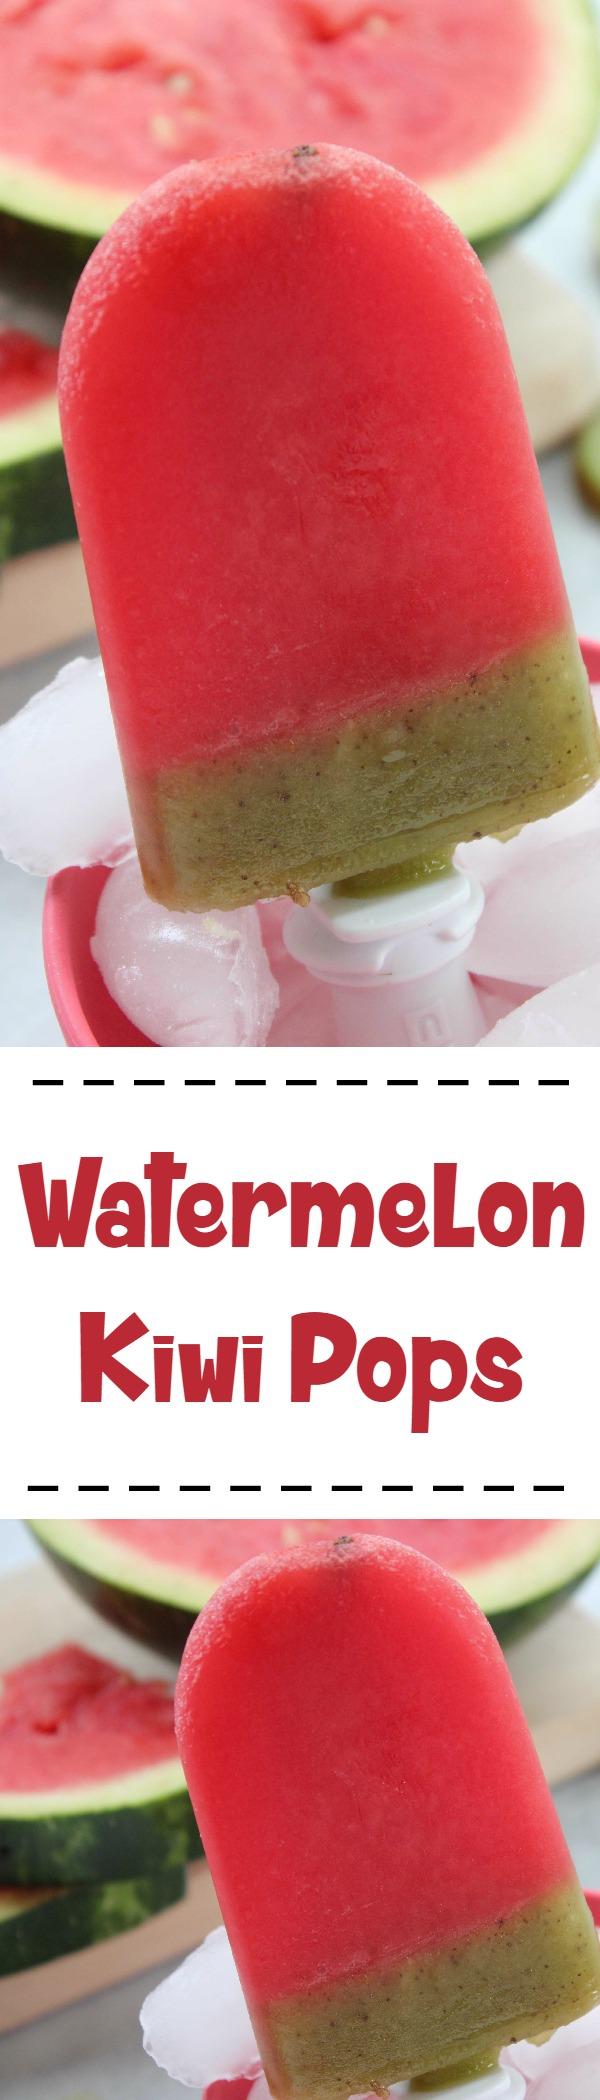 Watermelon Kiwi Pops Recipe